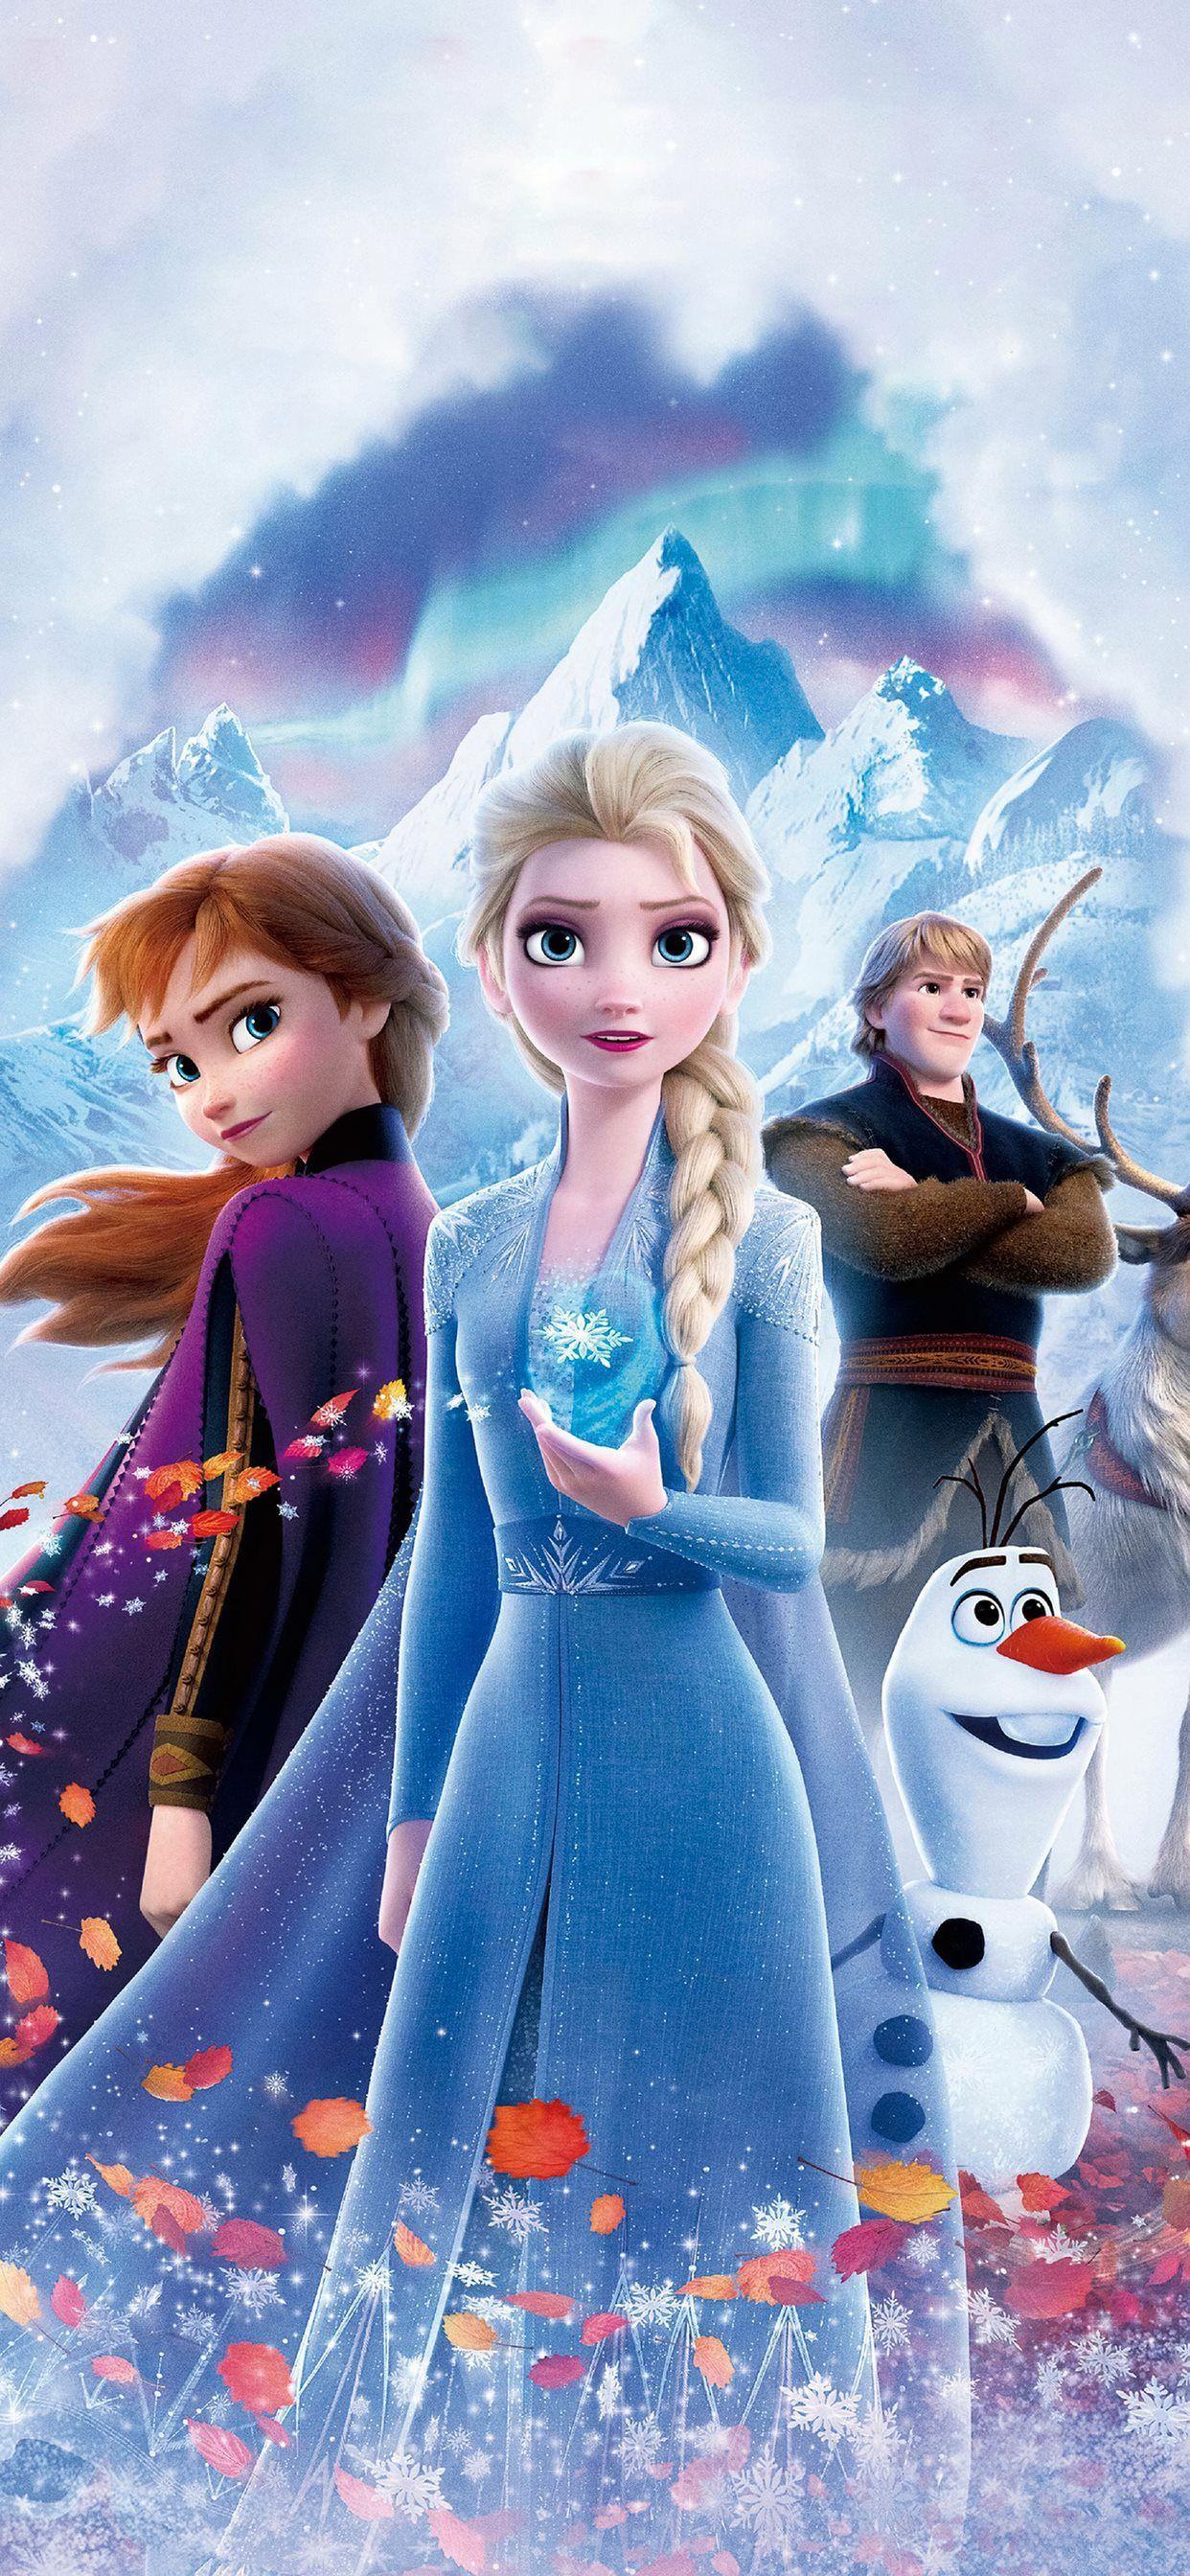 Frozen 2 Iphone Wallpapers Top Free Frozen 2 Iphone Backgrounds Wallpaperaccess